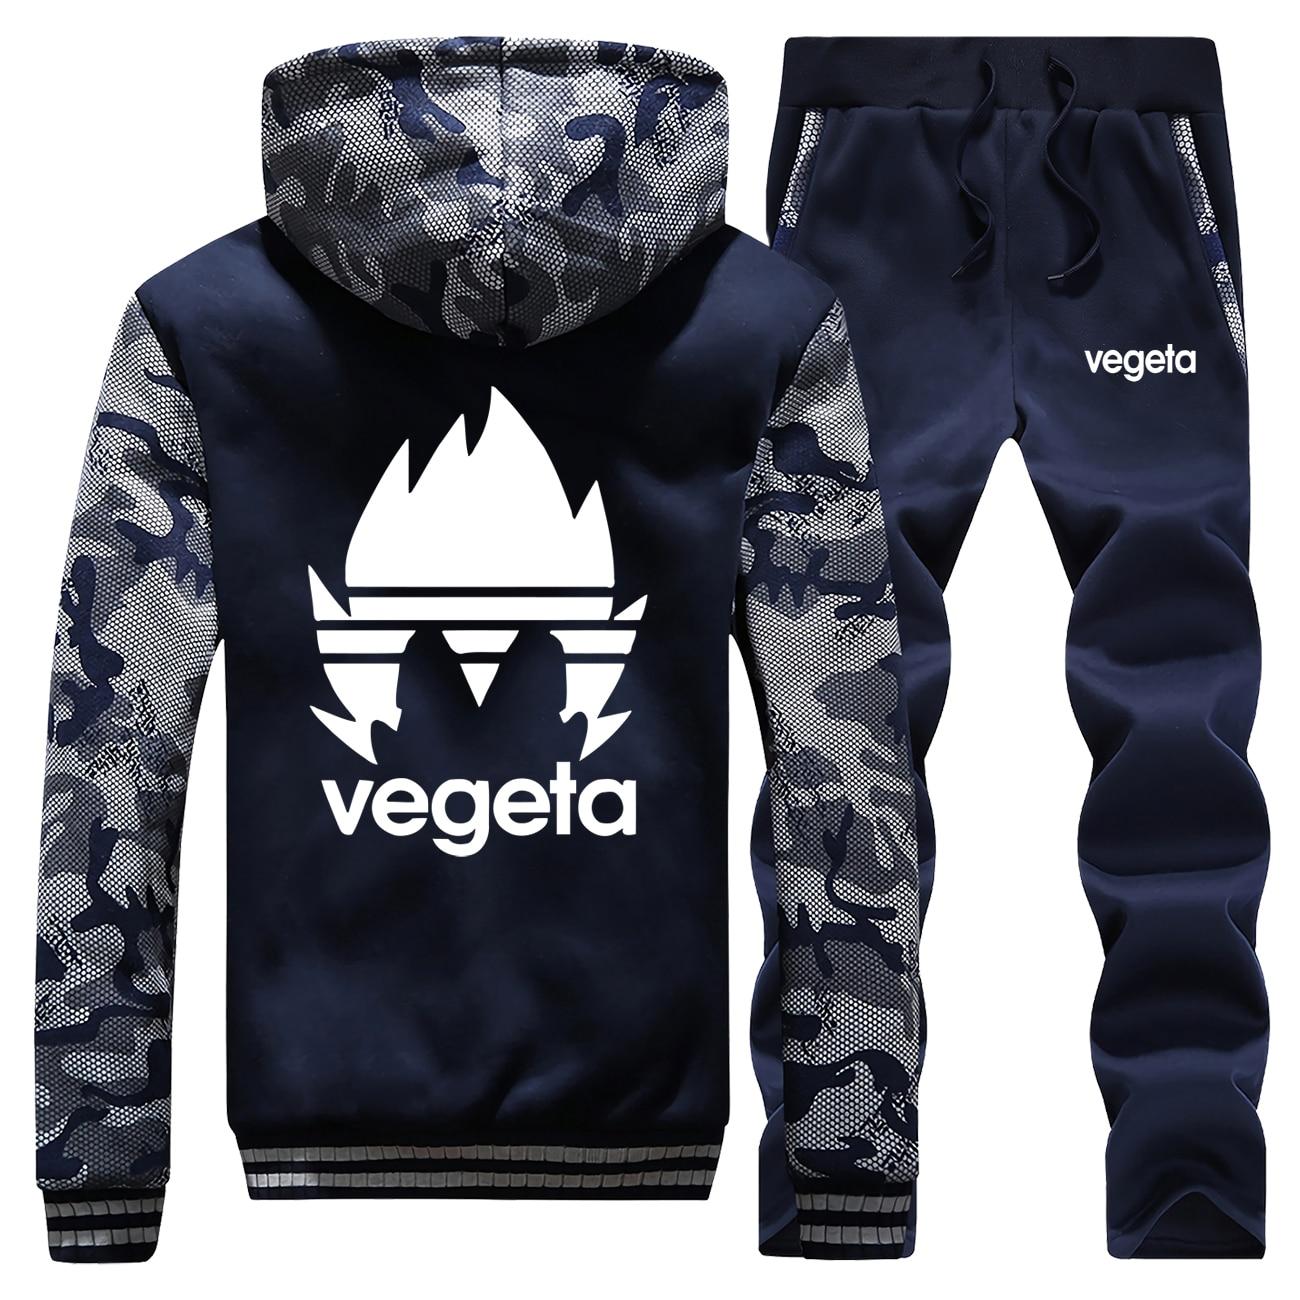 Dragon Ball Hoodies Pant Set Men Japan Anime Tracksuit Coat Vegeta Track Suit Winter Thick Fleece Sportswear Jacket 2 Piece Sets